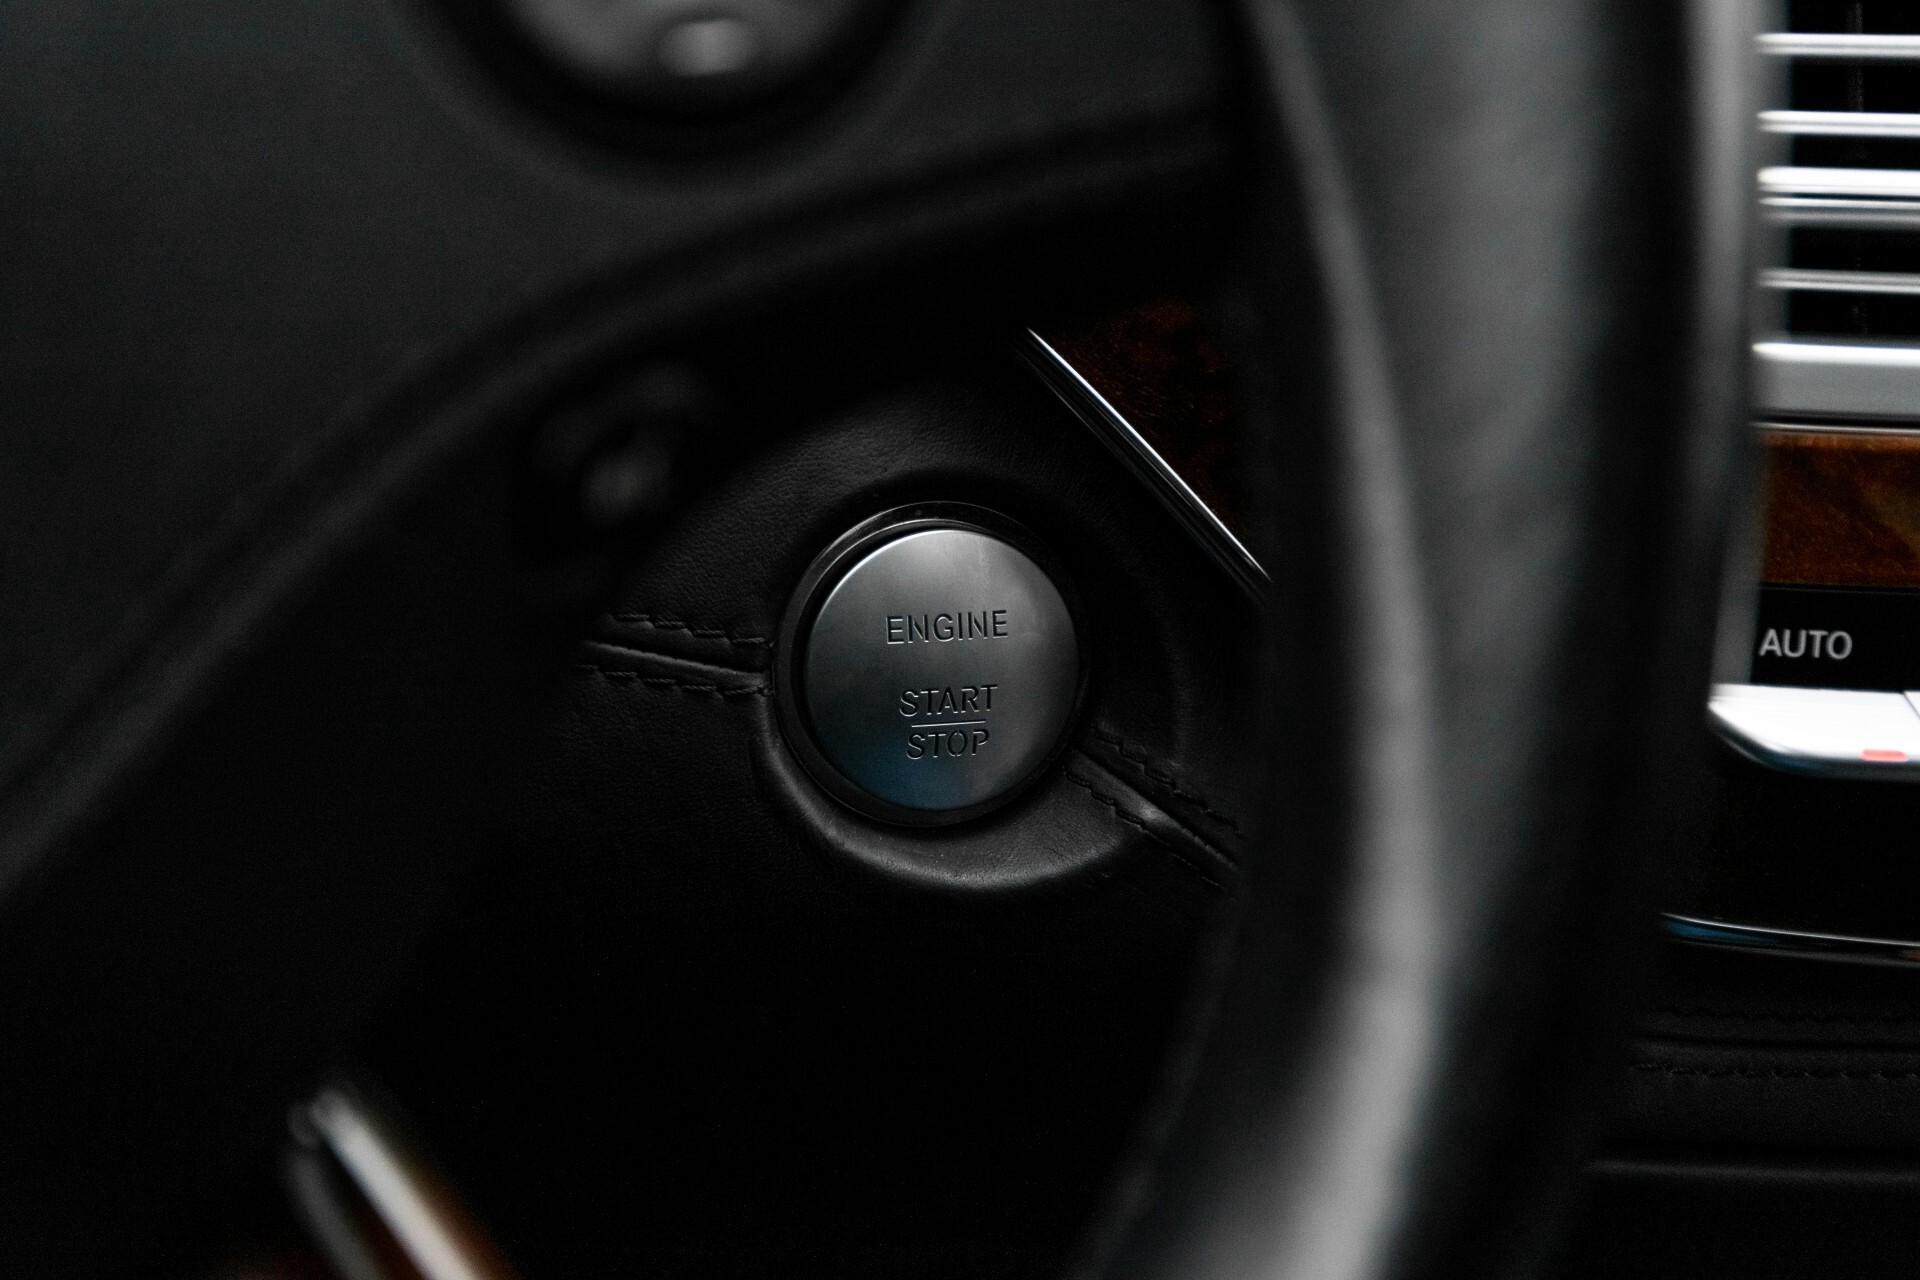 Mercedes-Benz S-Klasse 600 Lang 65 AMG Bi-Turbo Prestige Plus Aut5 Foto 15